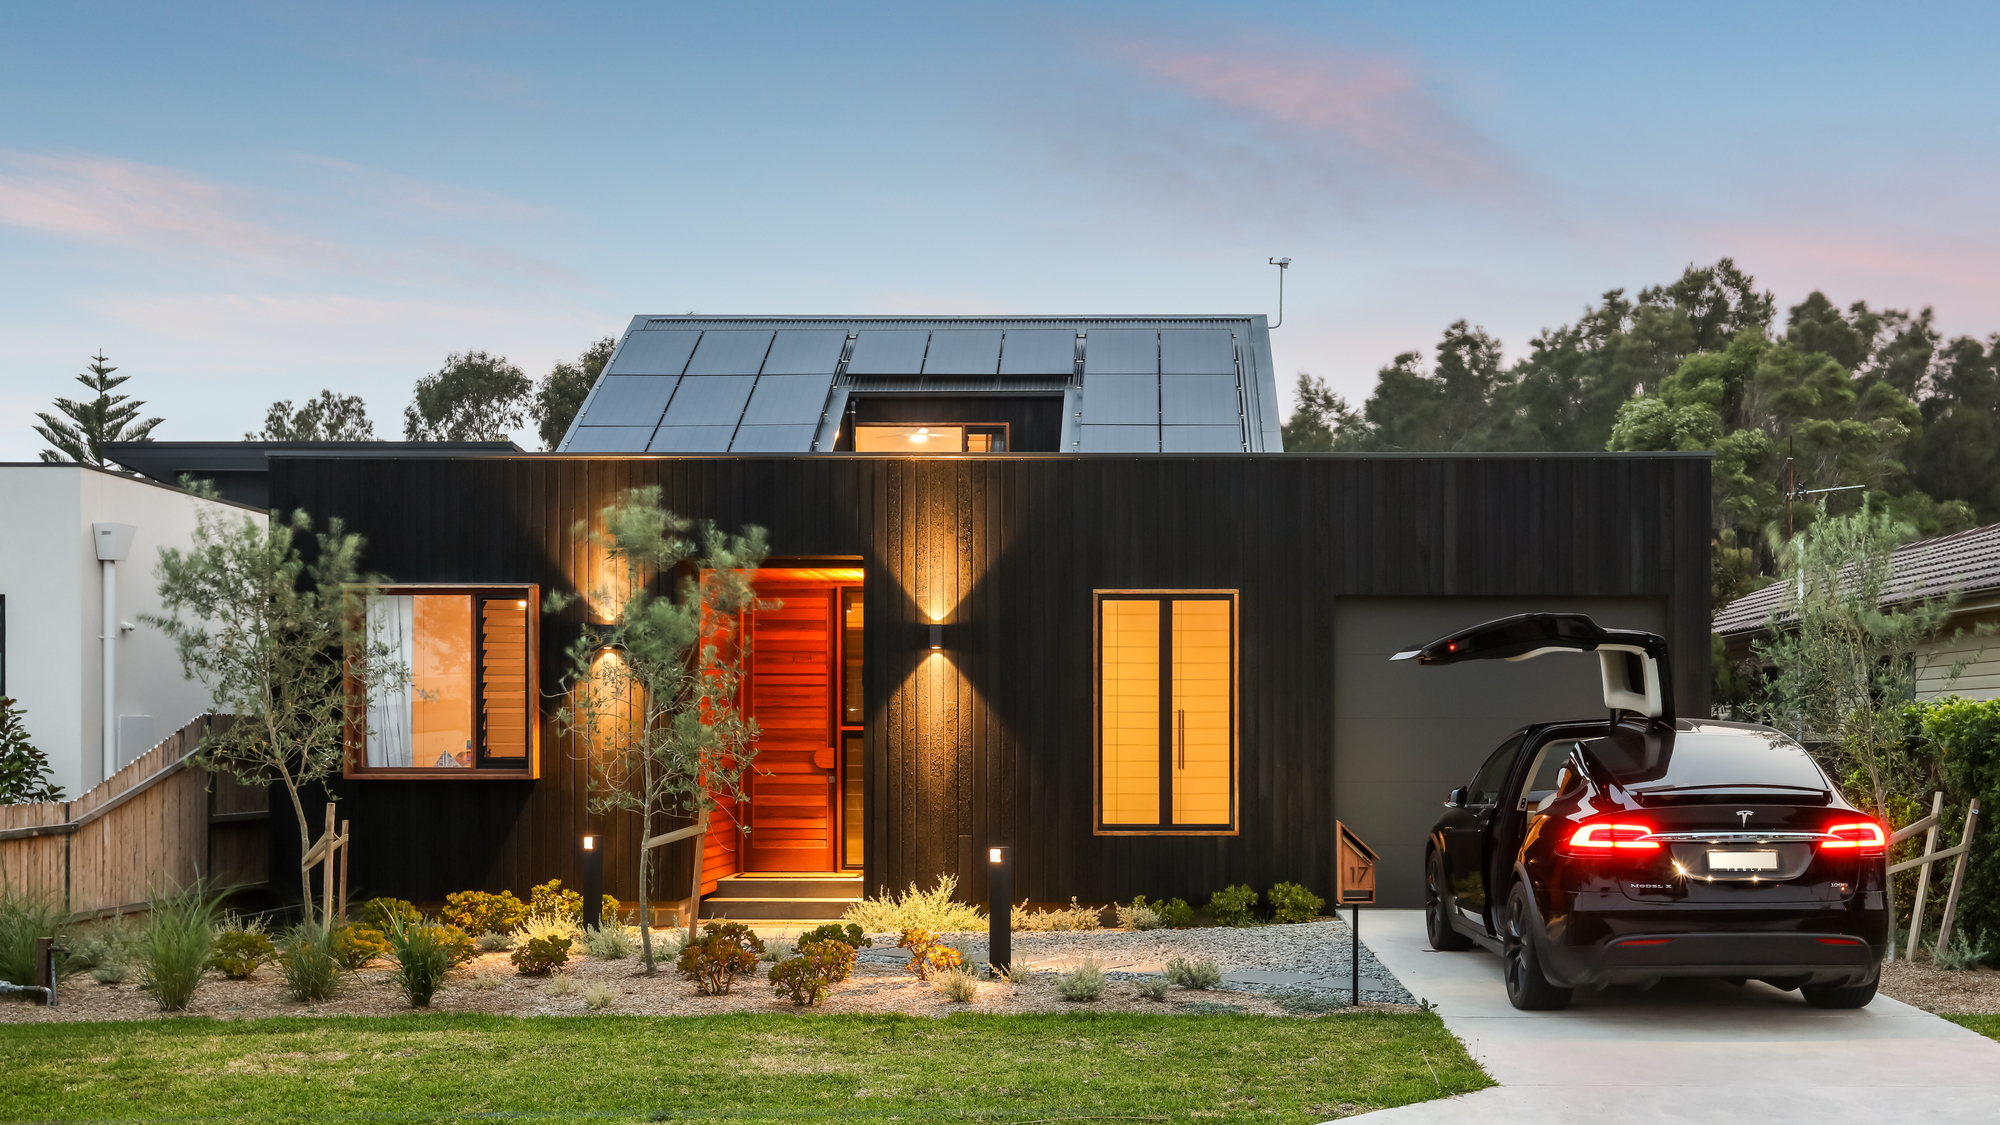 Edgar St. House / Alex Urena Design Studio